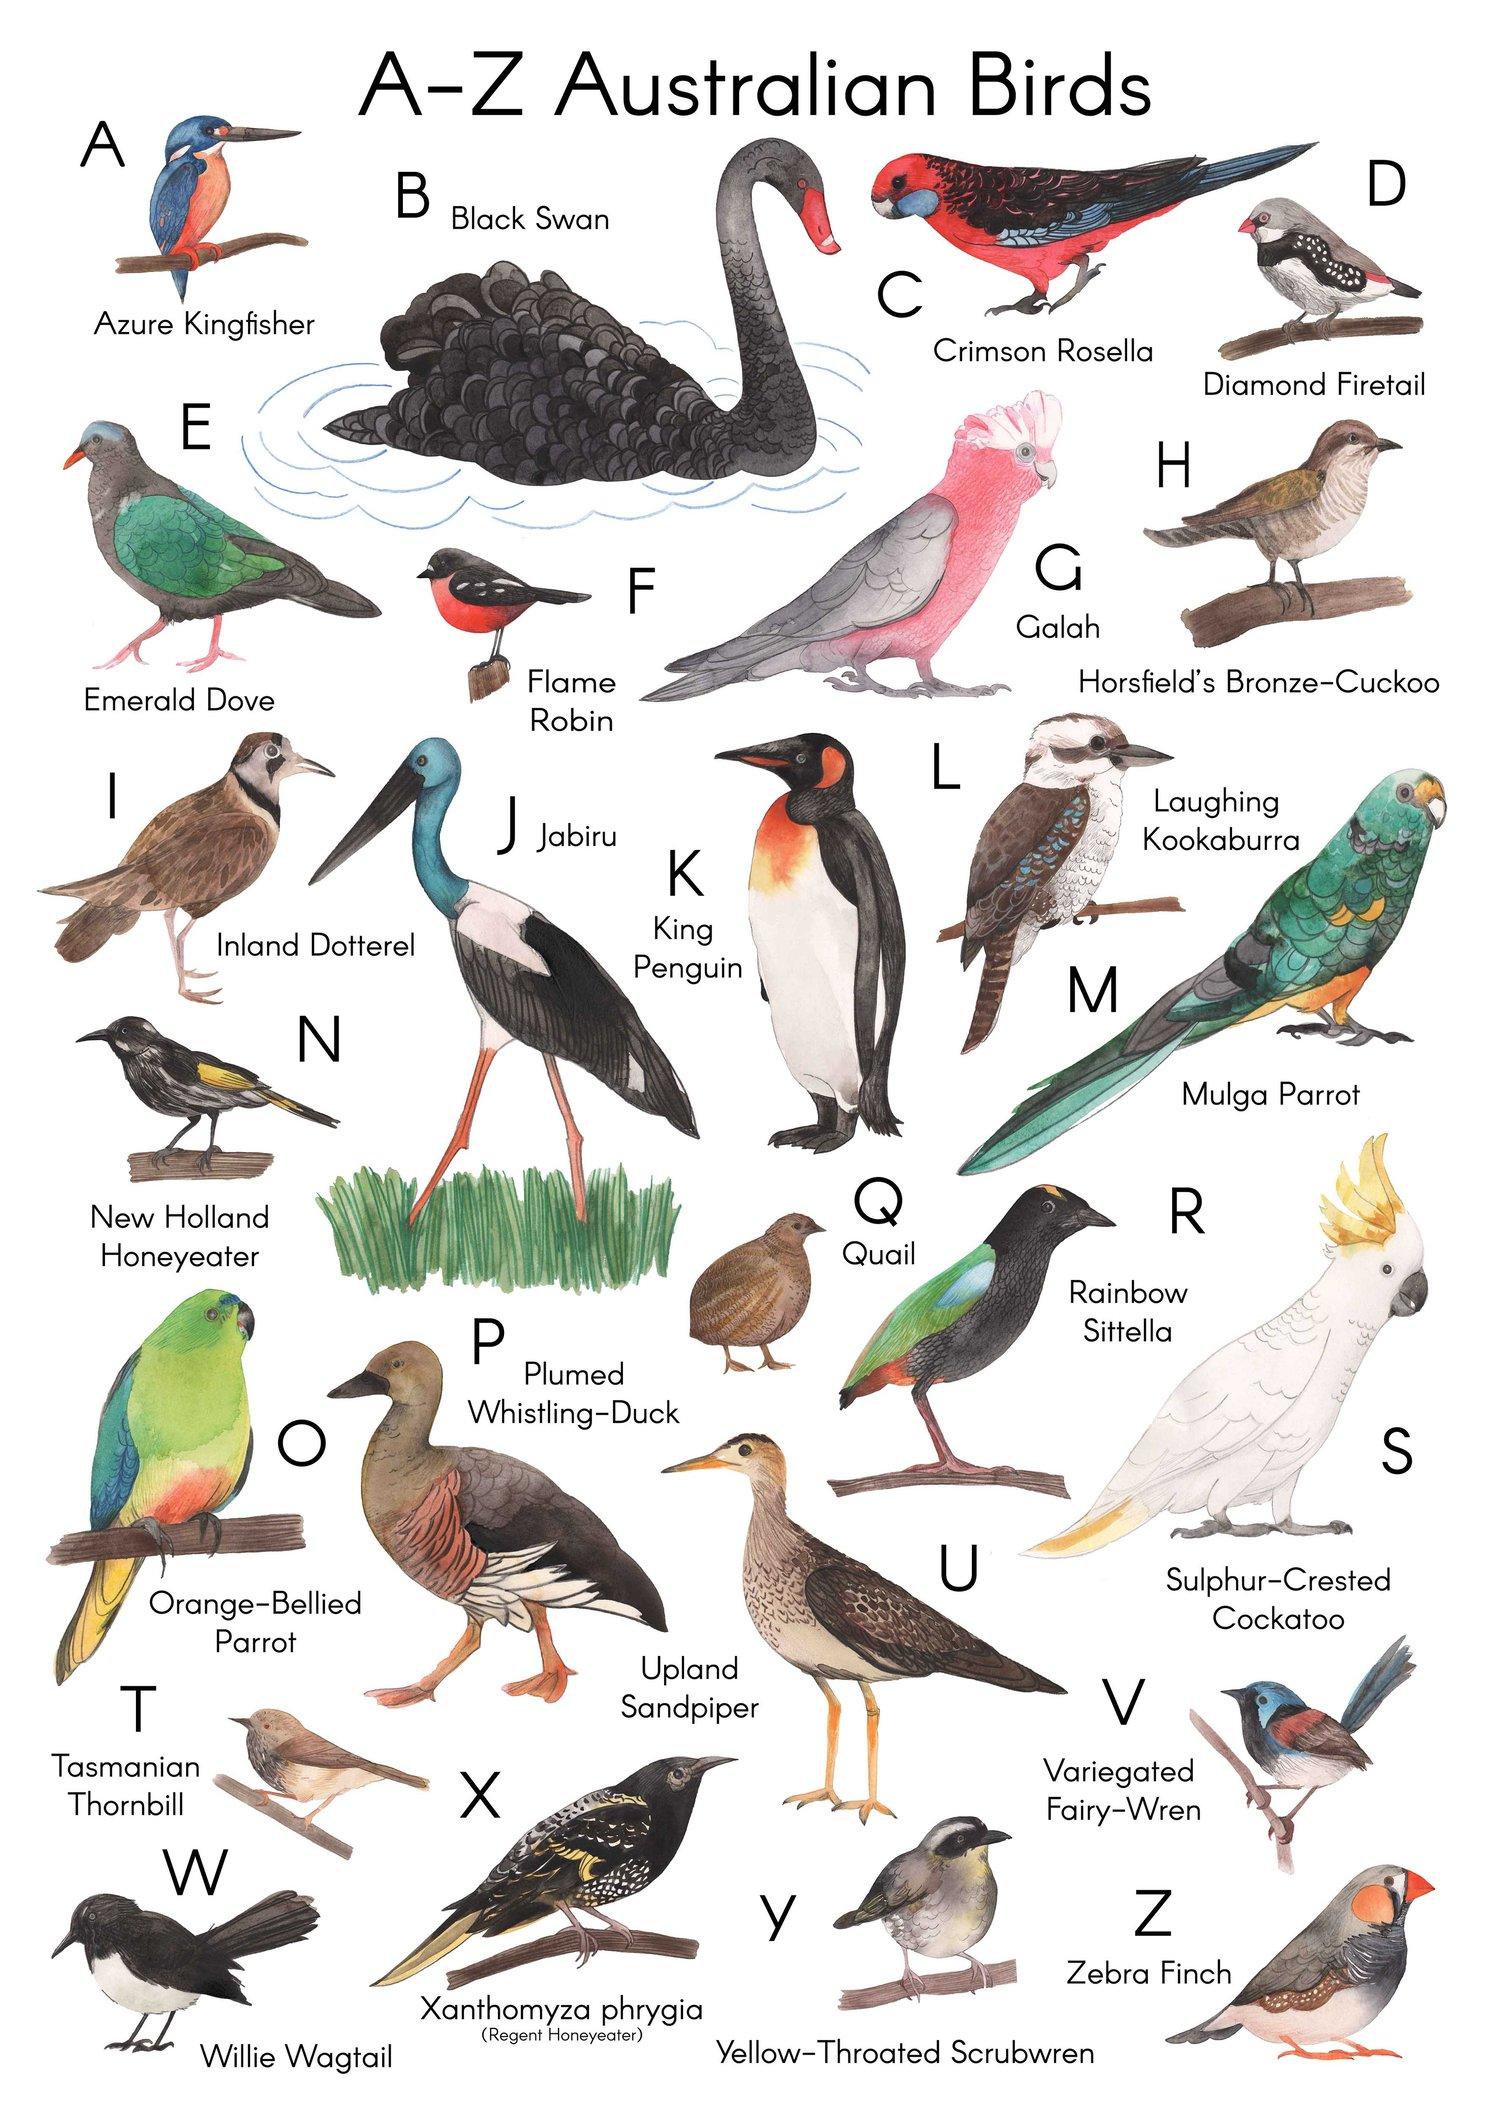 Image of A-Z Australian Birds